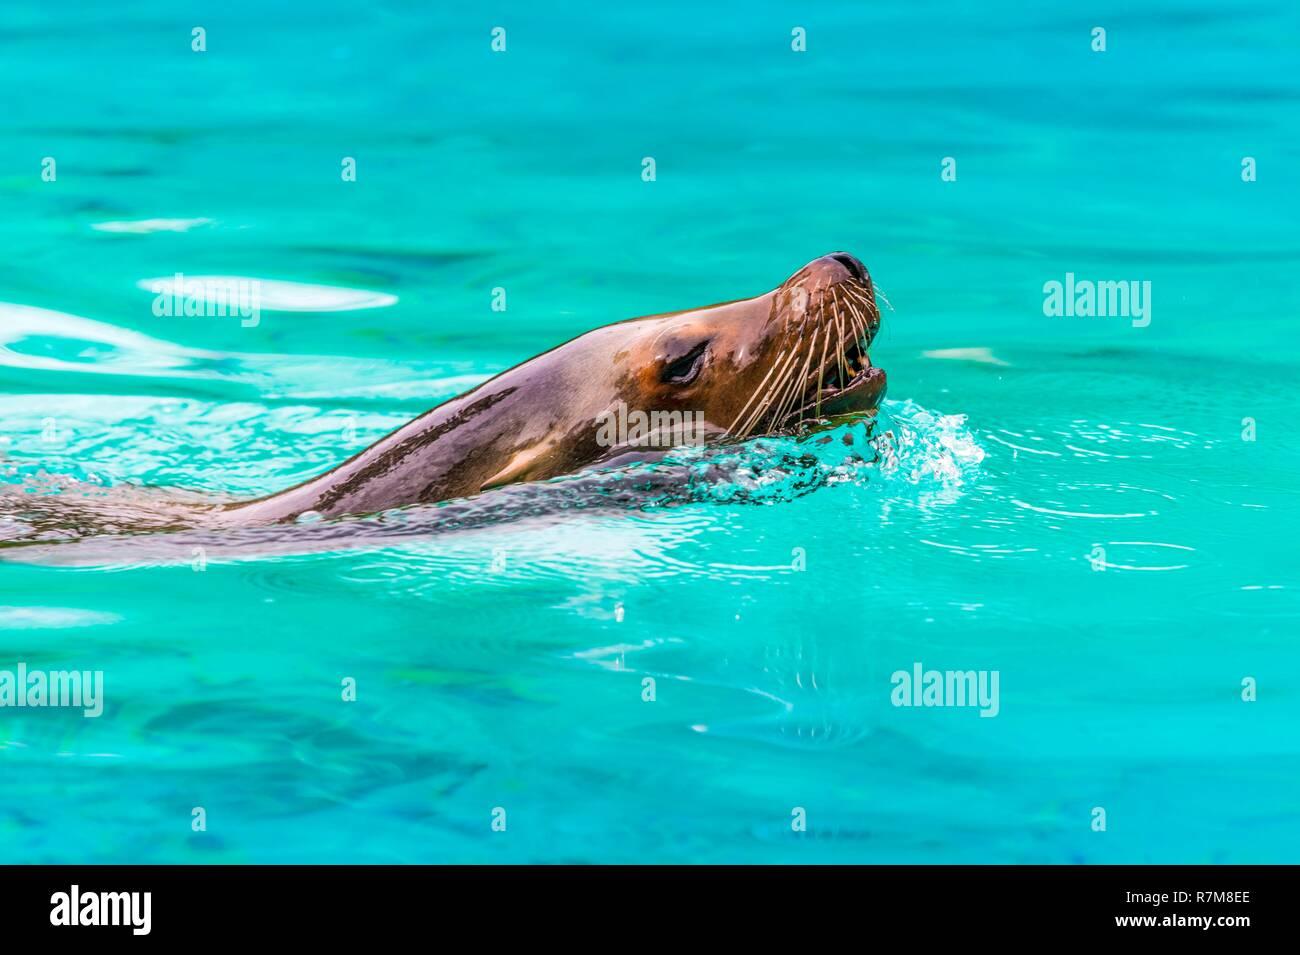 France, Sarthe, La Fleche, La Fleche Zoo, California Sea Lion (Zalophus californianus) Swimming in its poolotection Status, Locally Protected Species, IUCN Status, Least Concern (LR-lc) - Stock Image